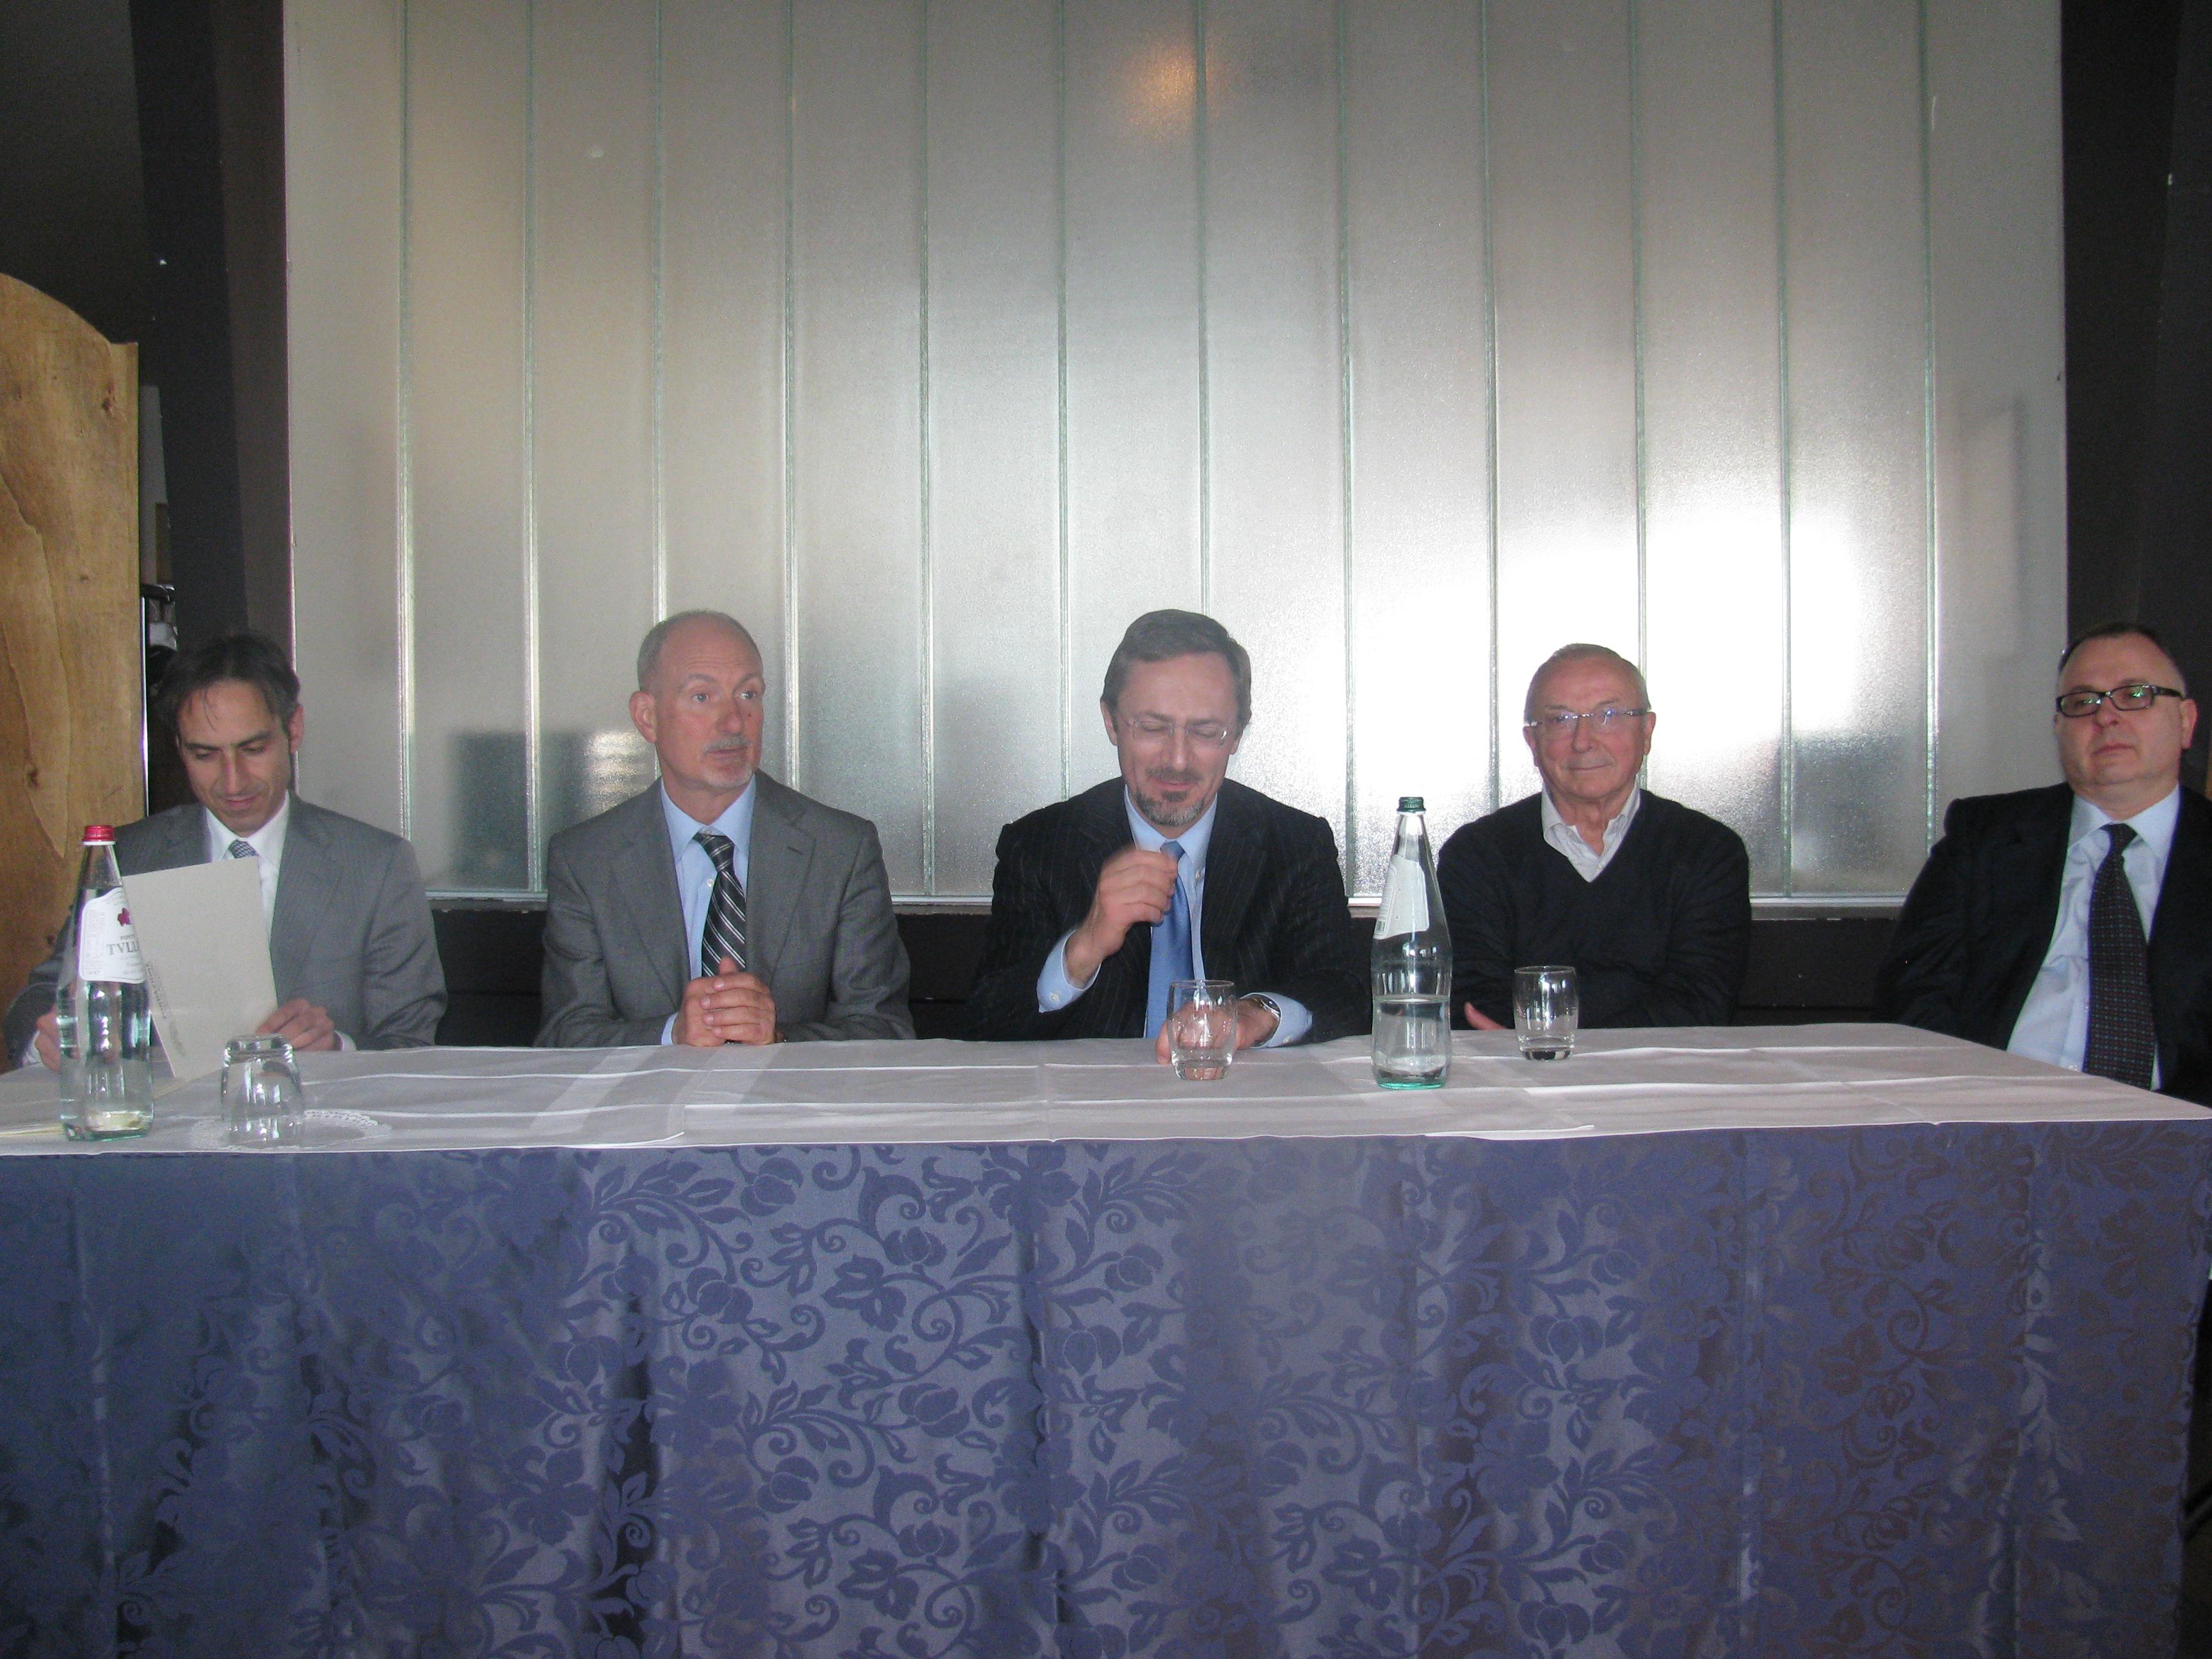 Conferenza stampa all'Ipssar